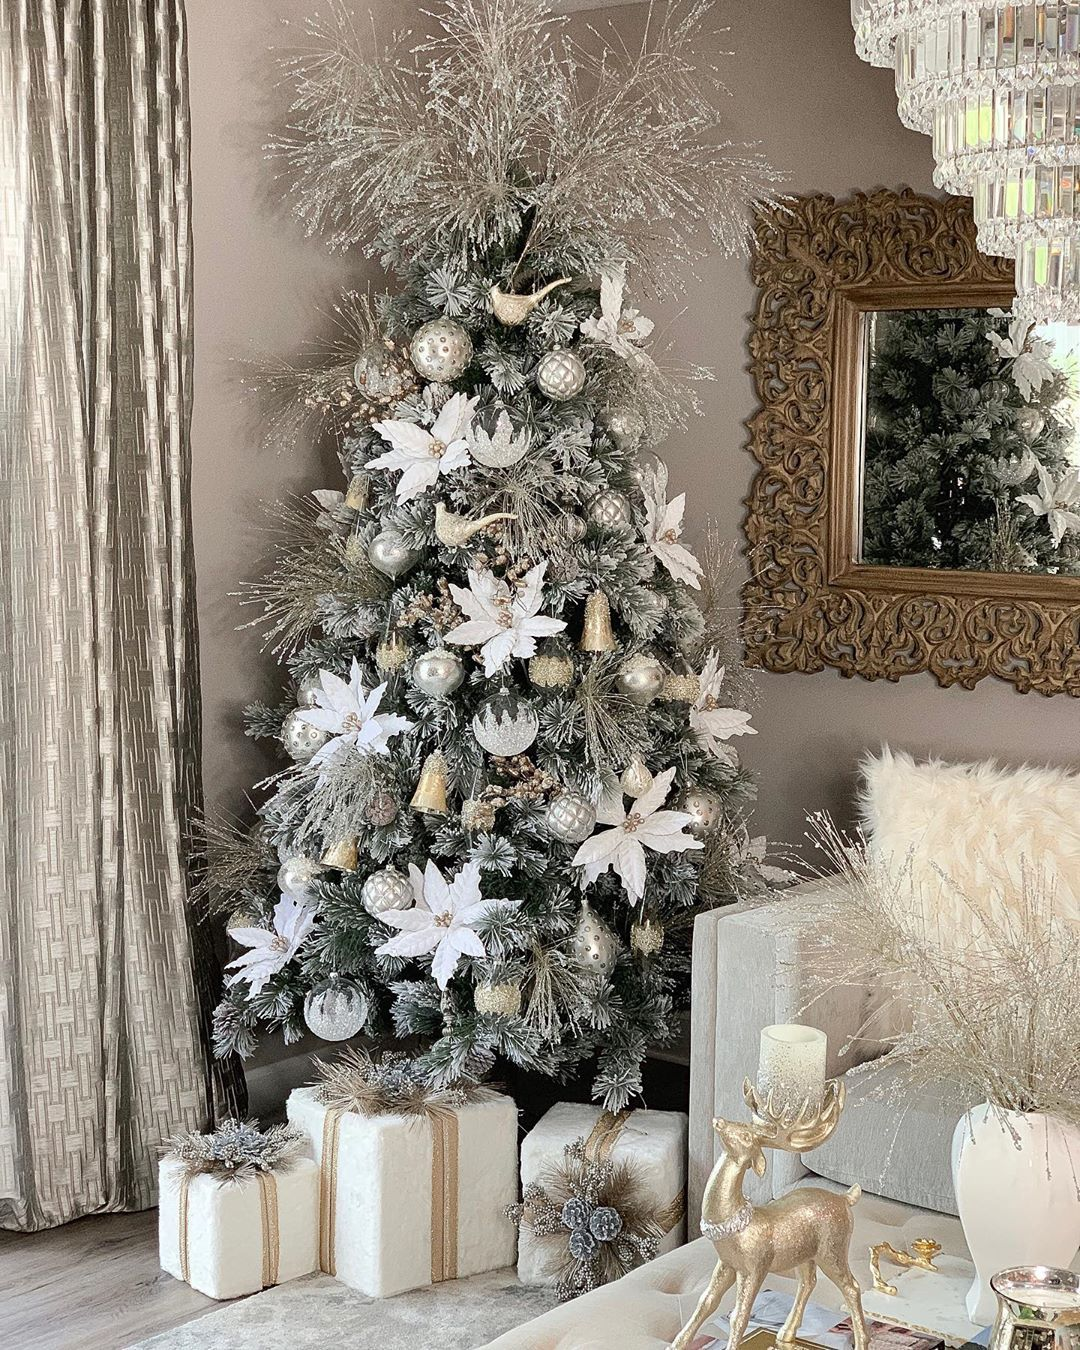 8 903 Likes 489 Comments Farah Merhi Farahjmerhi On Instagram My White Christmas Tree Decorations Beautiful Christmas Trees Christmas Tree Inspiration